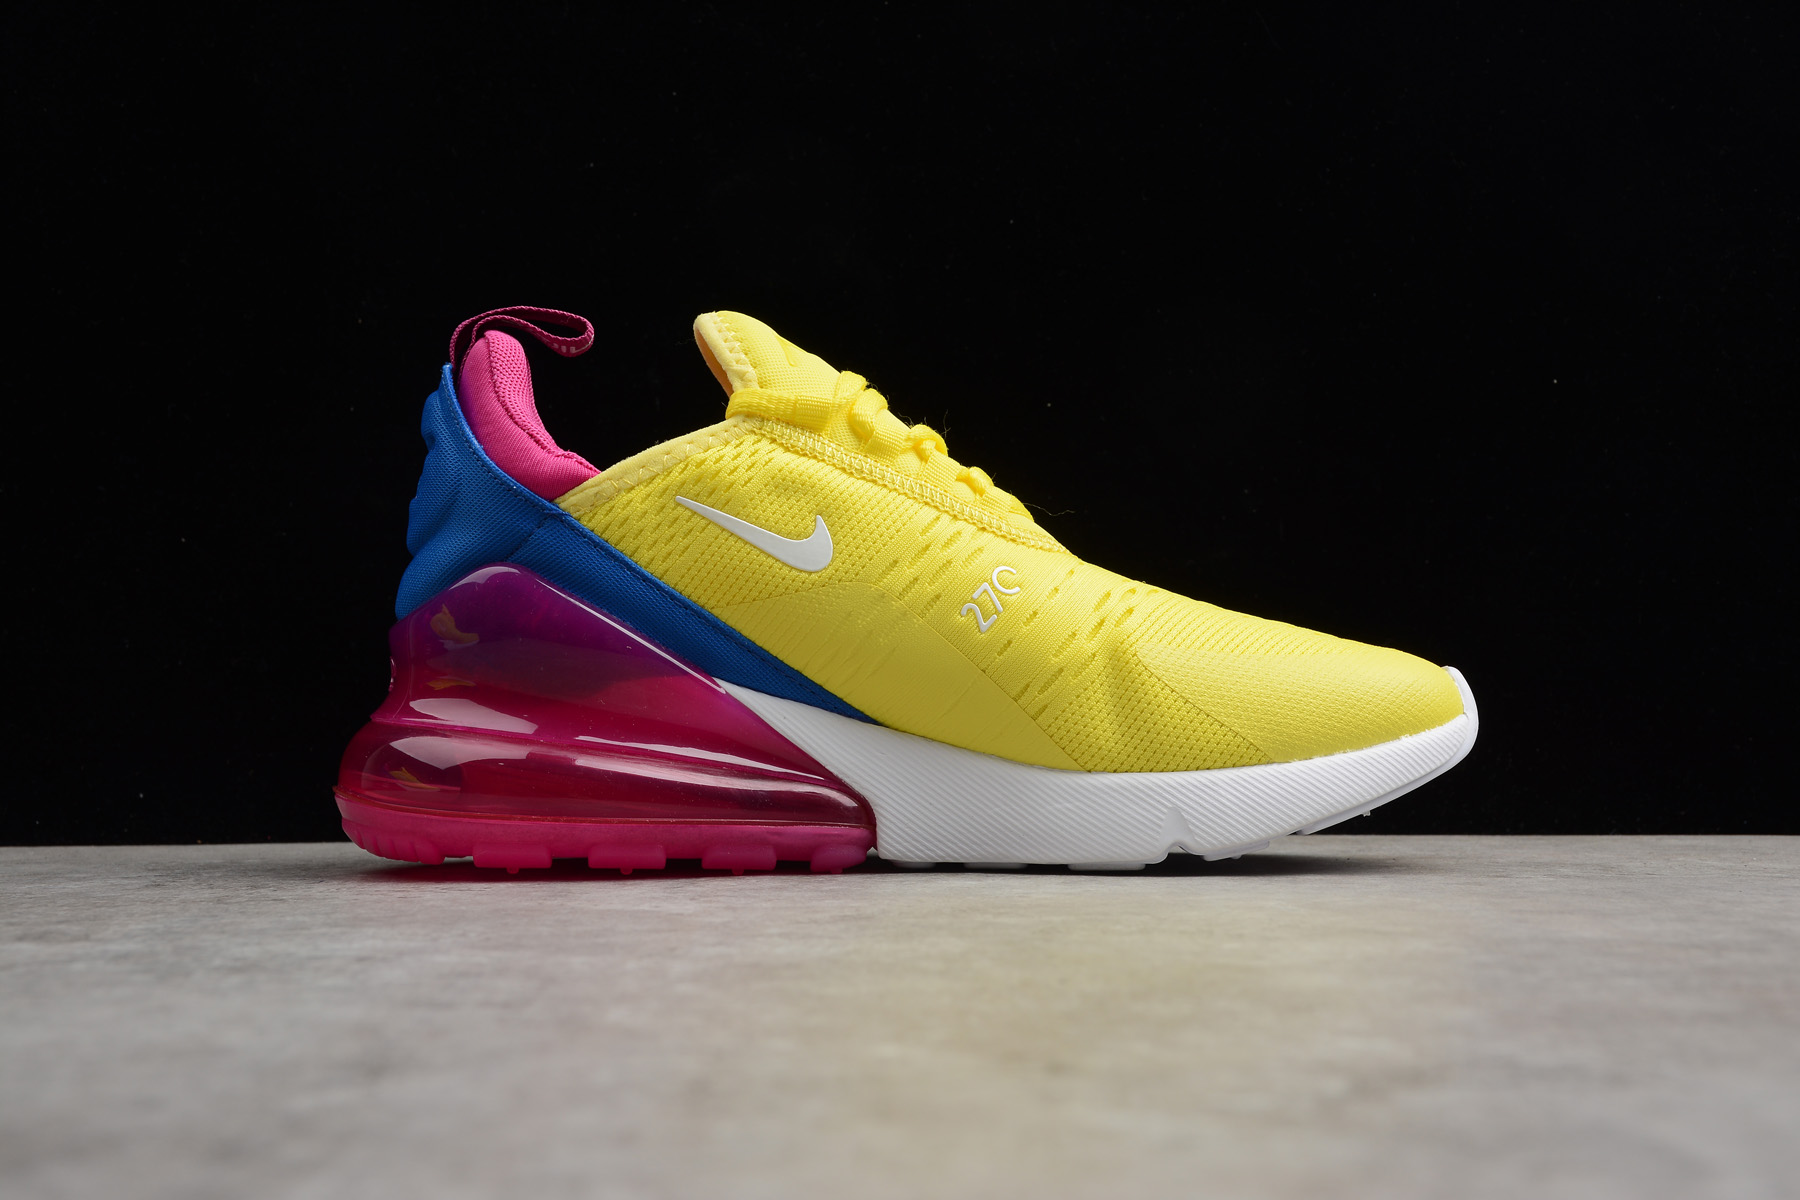 Women S Nike Air Max 270 Bright Lemon Yellow White Racer Blue